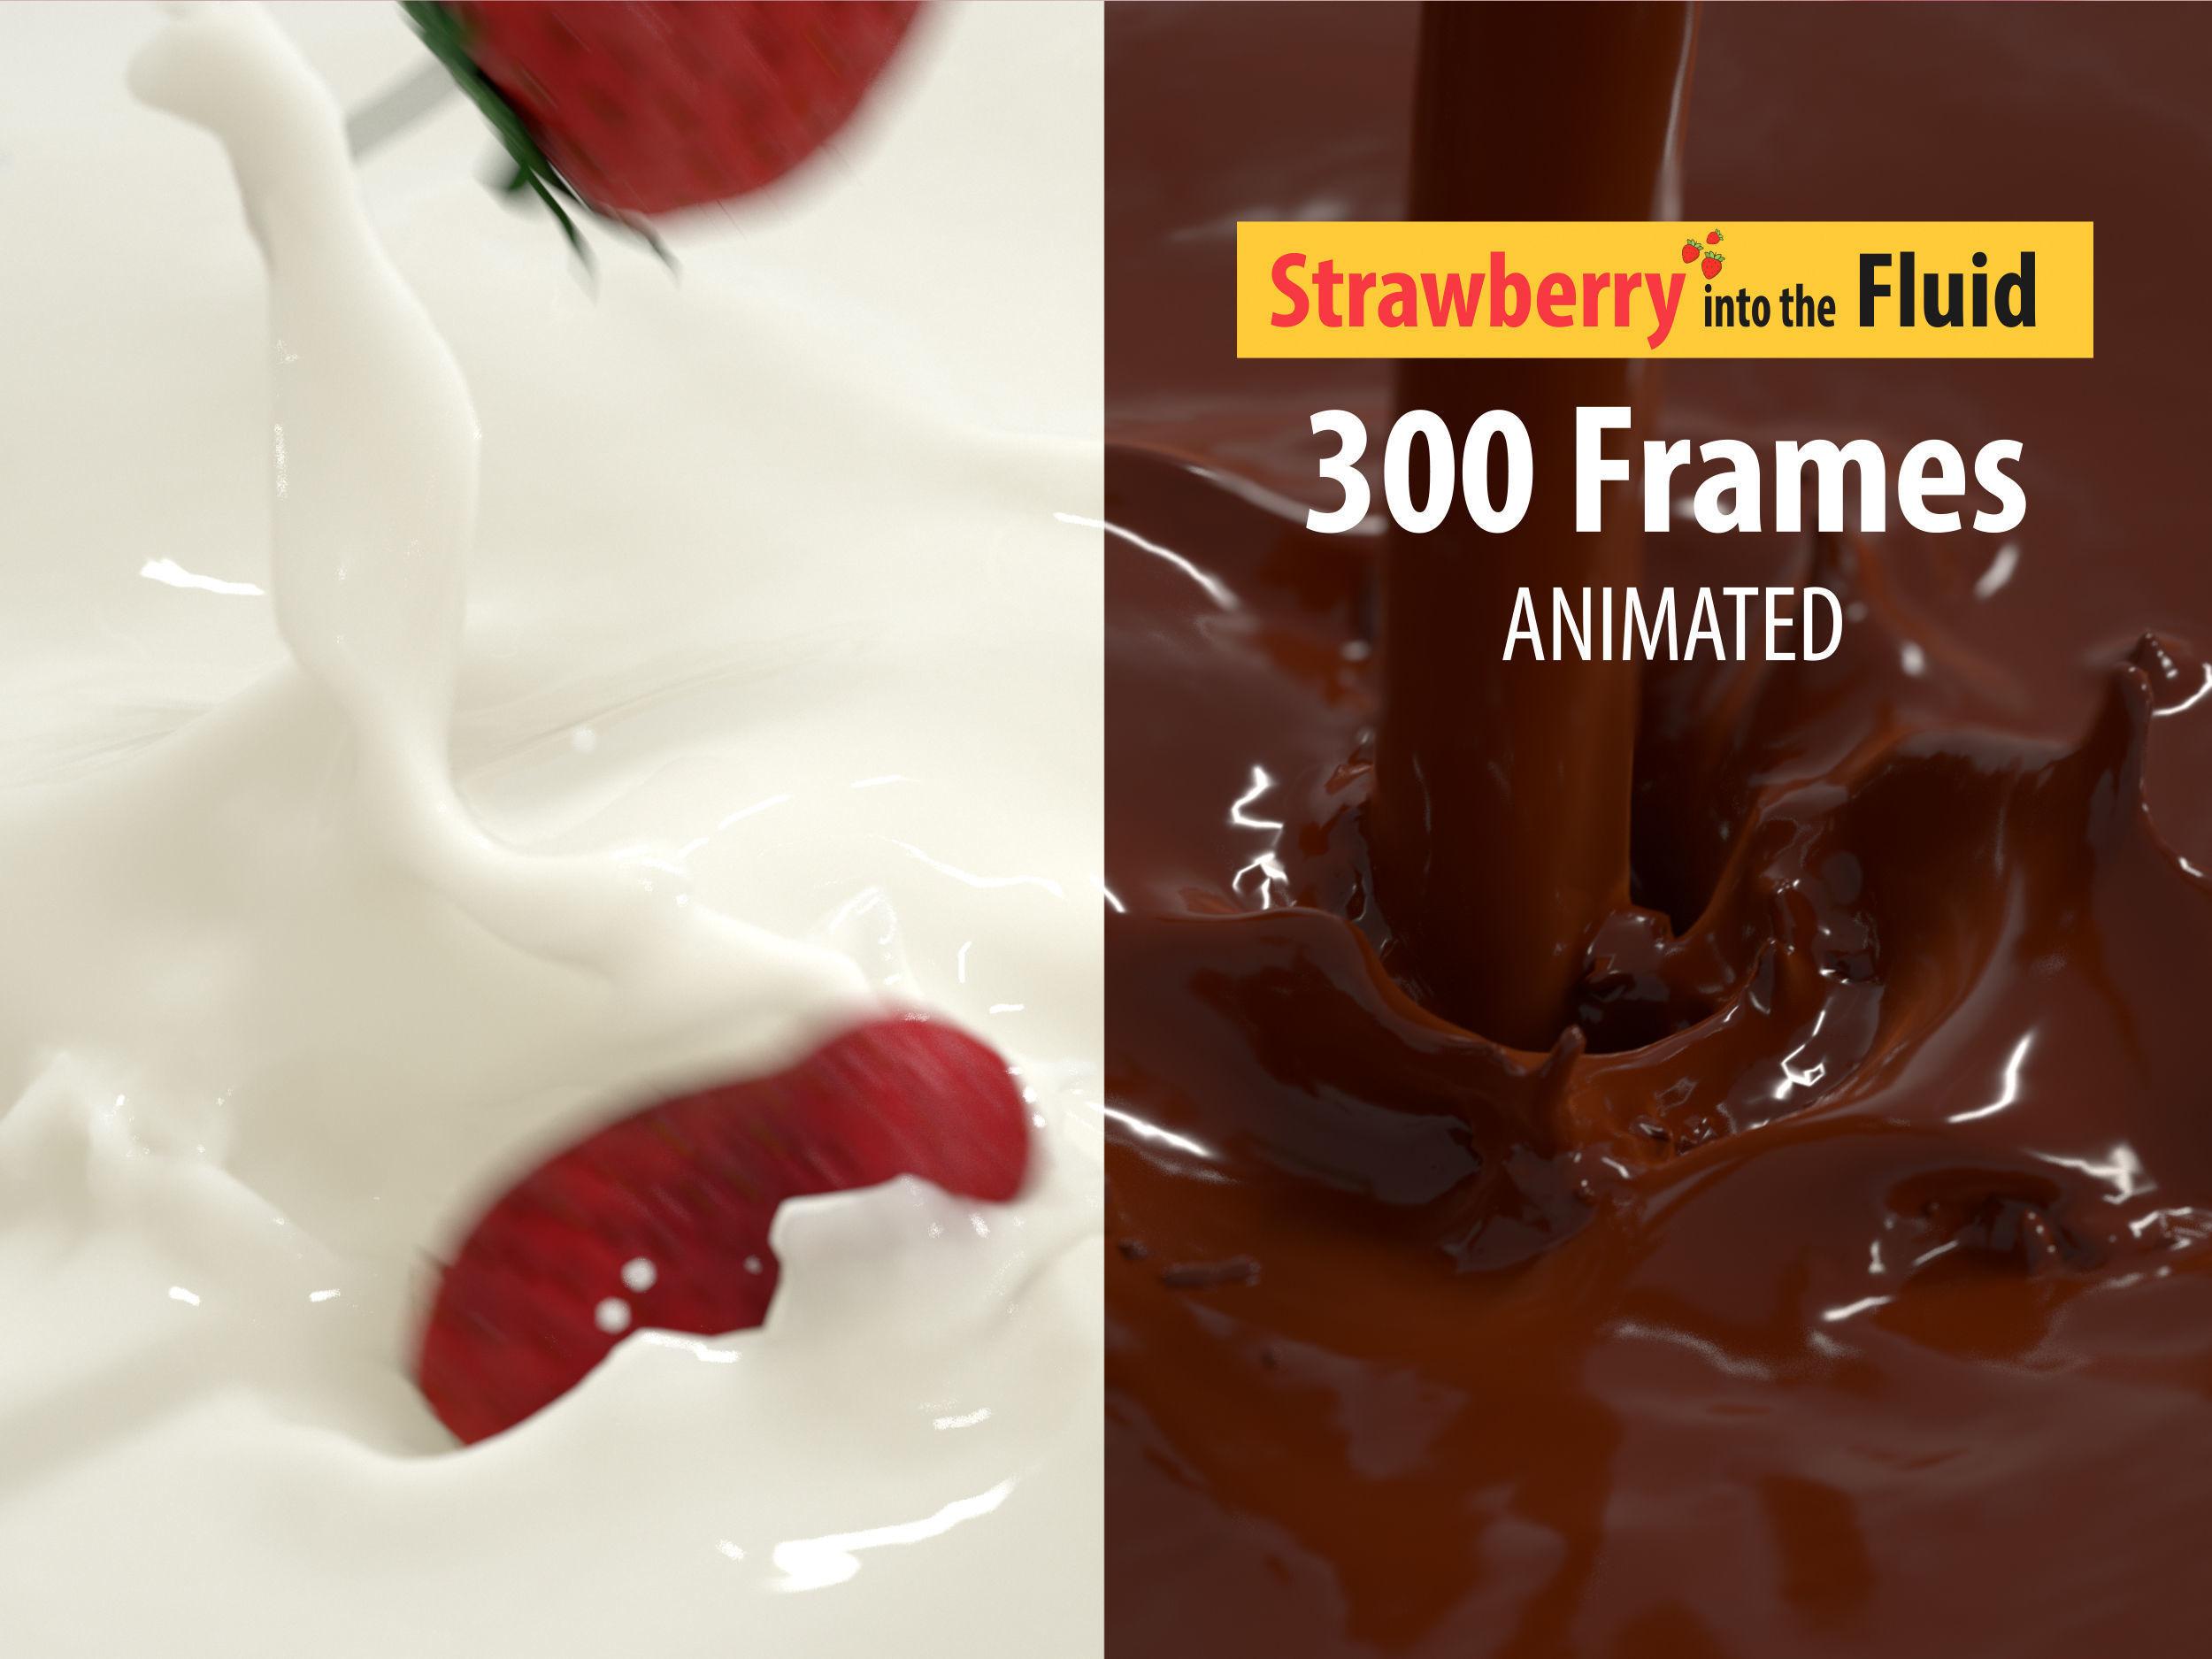 falling Strawberry into Milk and Chocolate Animated Splash